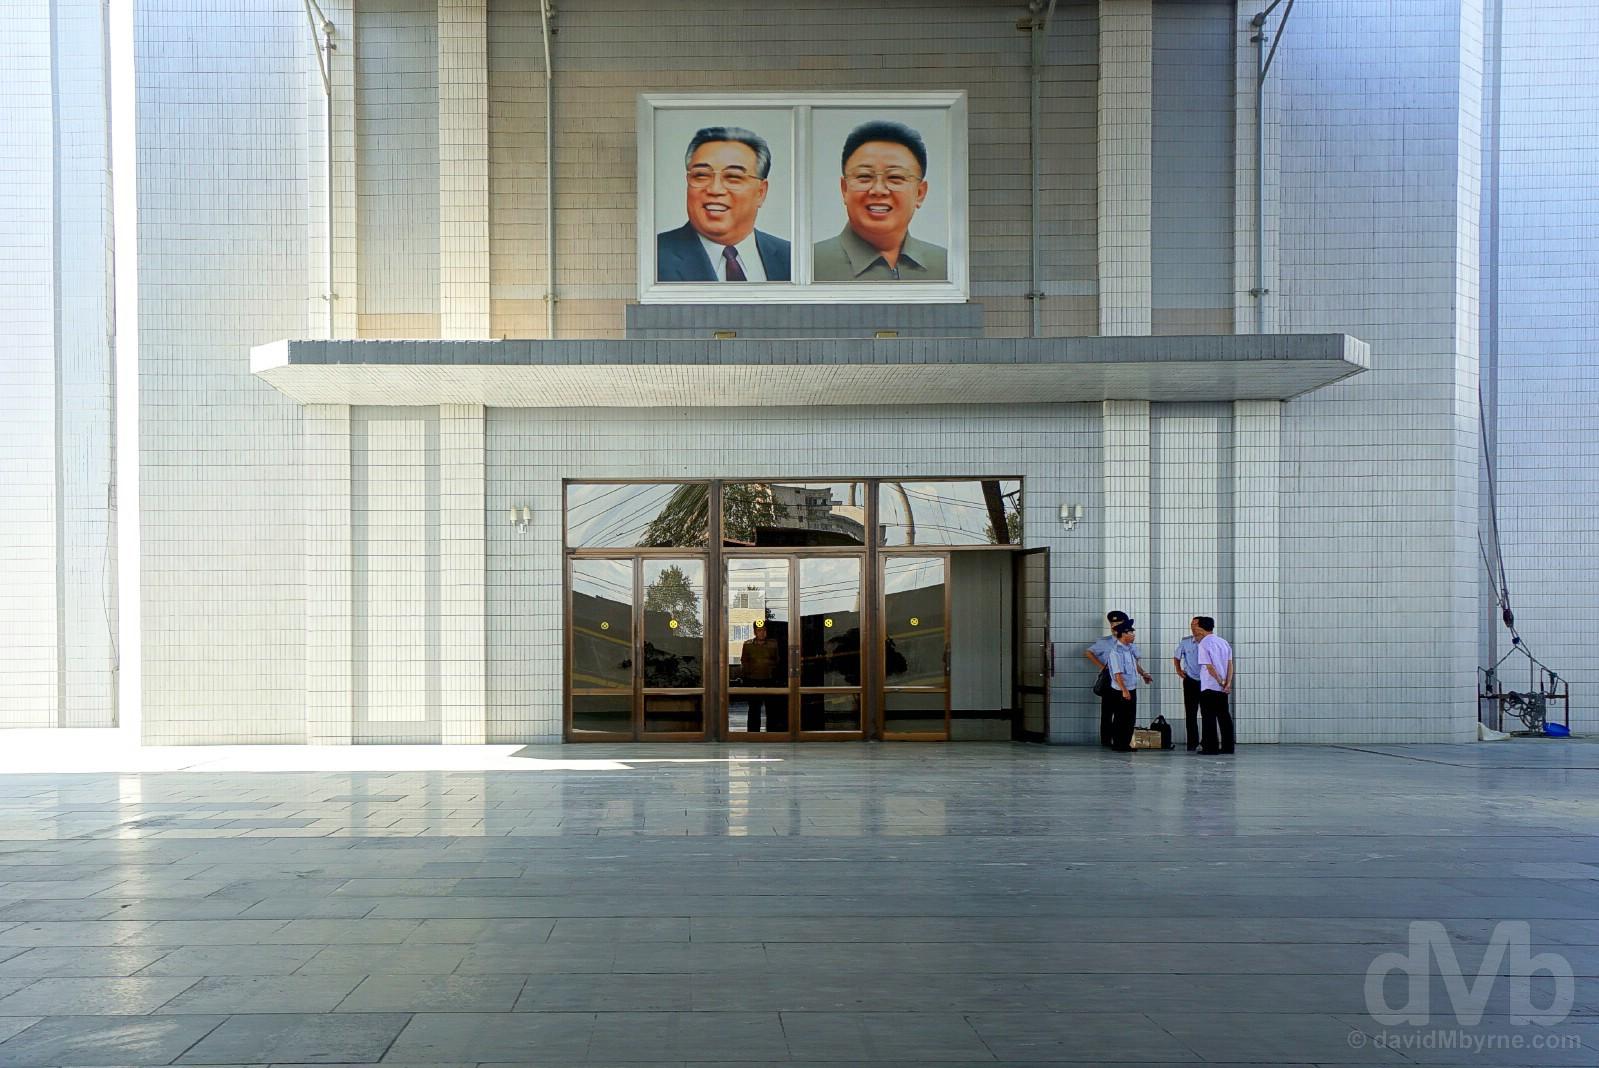 Sinuiju train station, North Korea. August 14, 2017.